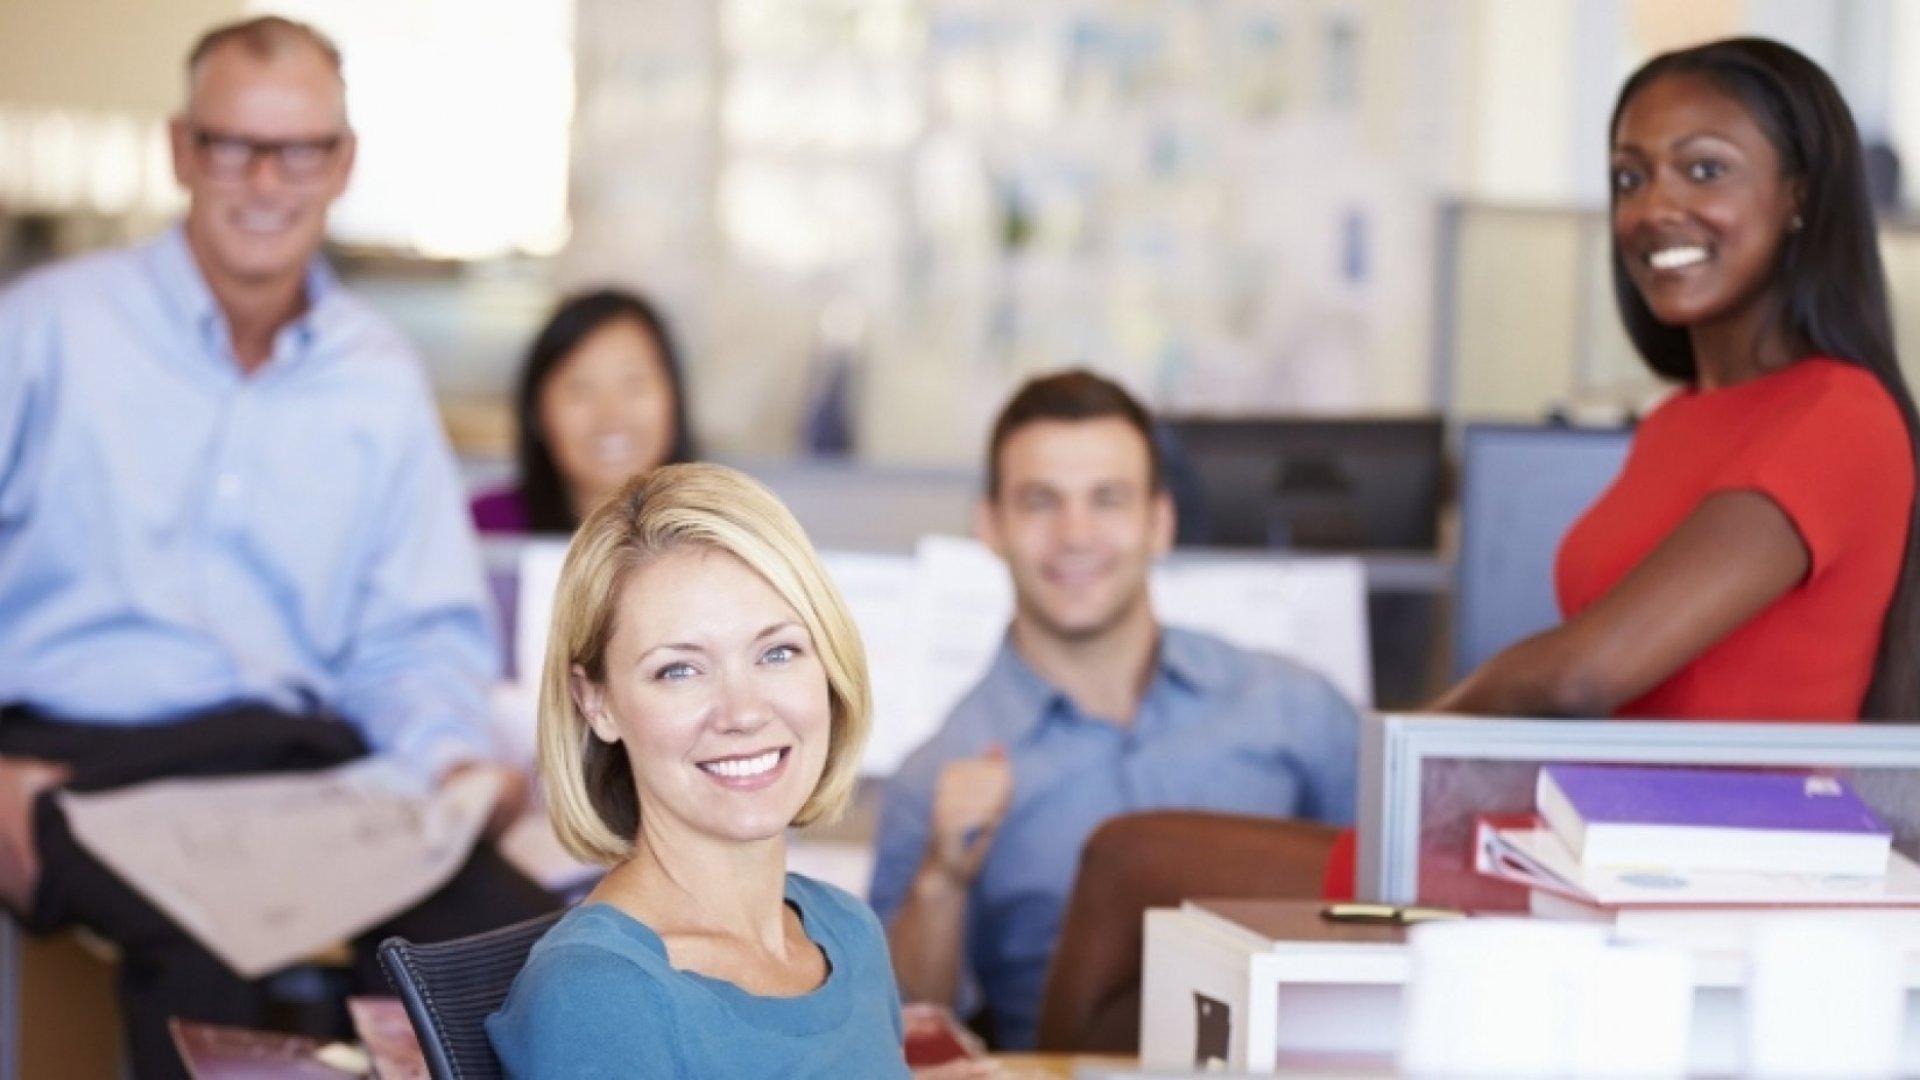 Measuring Employee Morale in the Organization